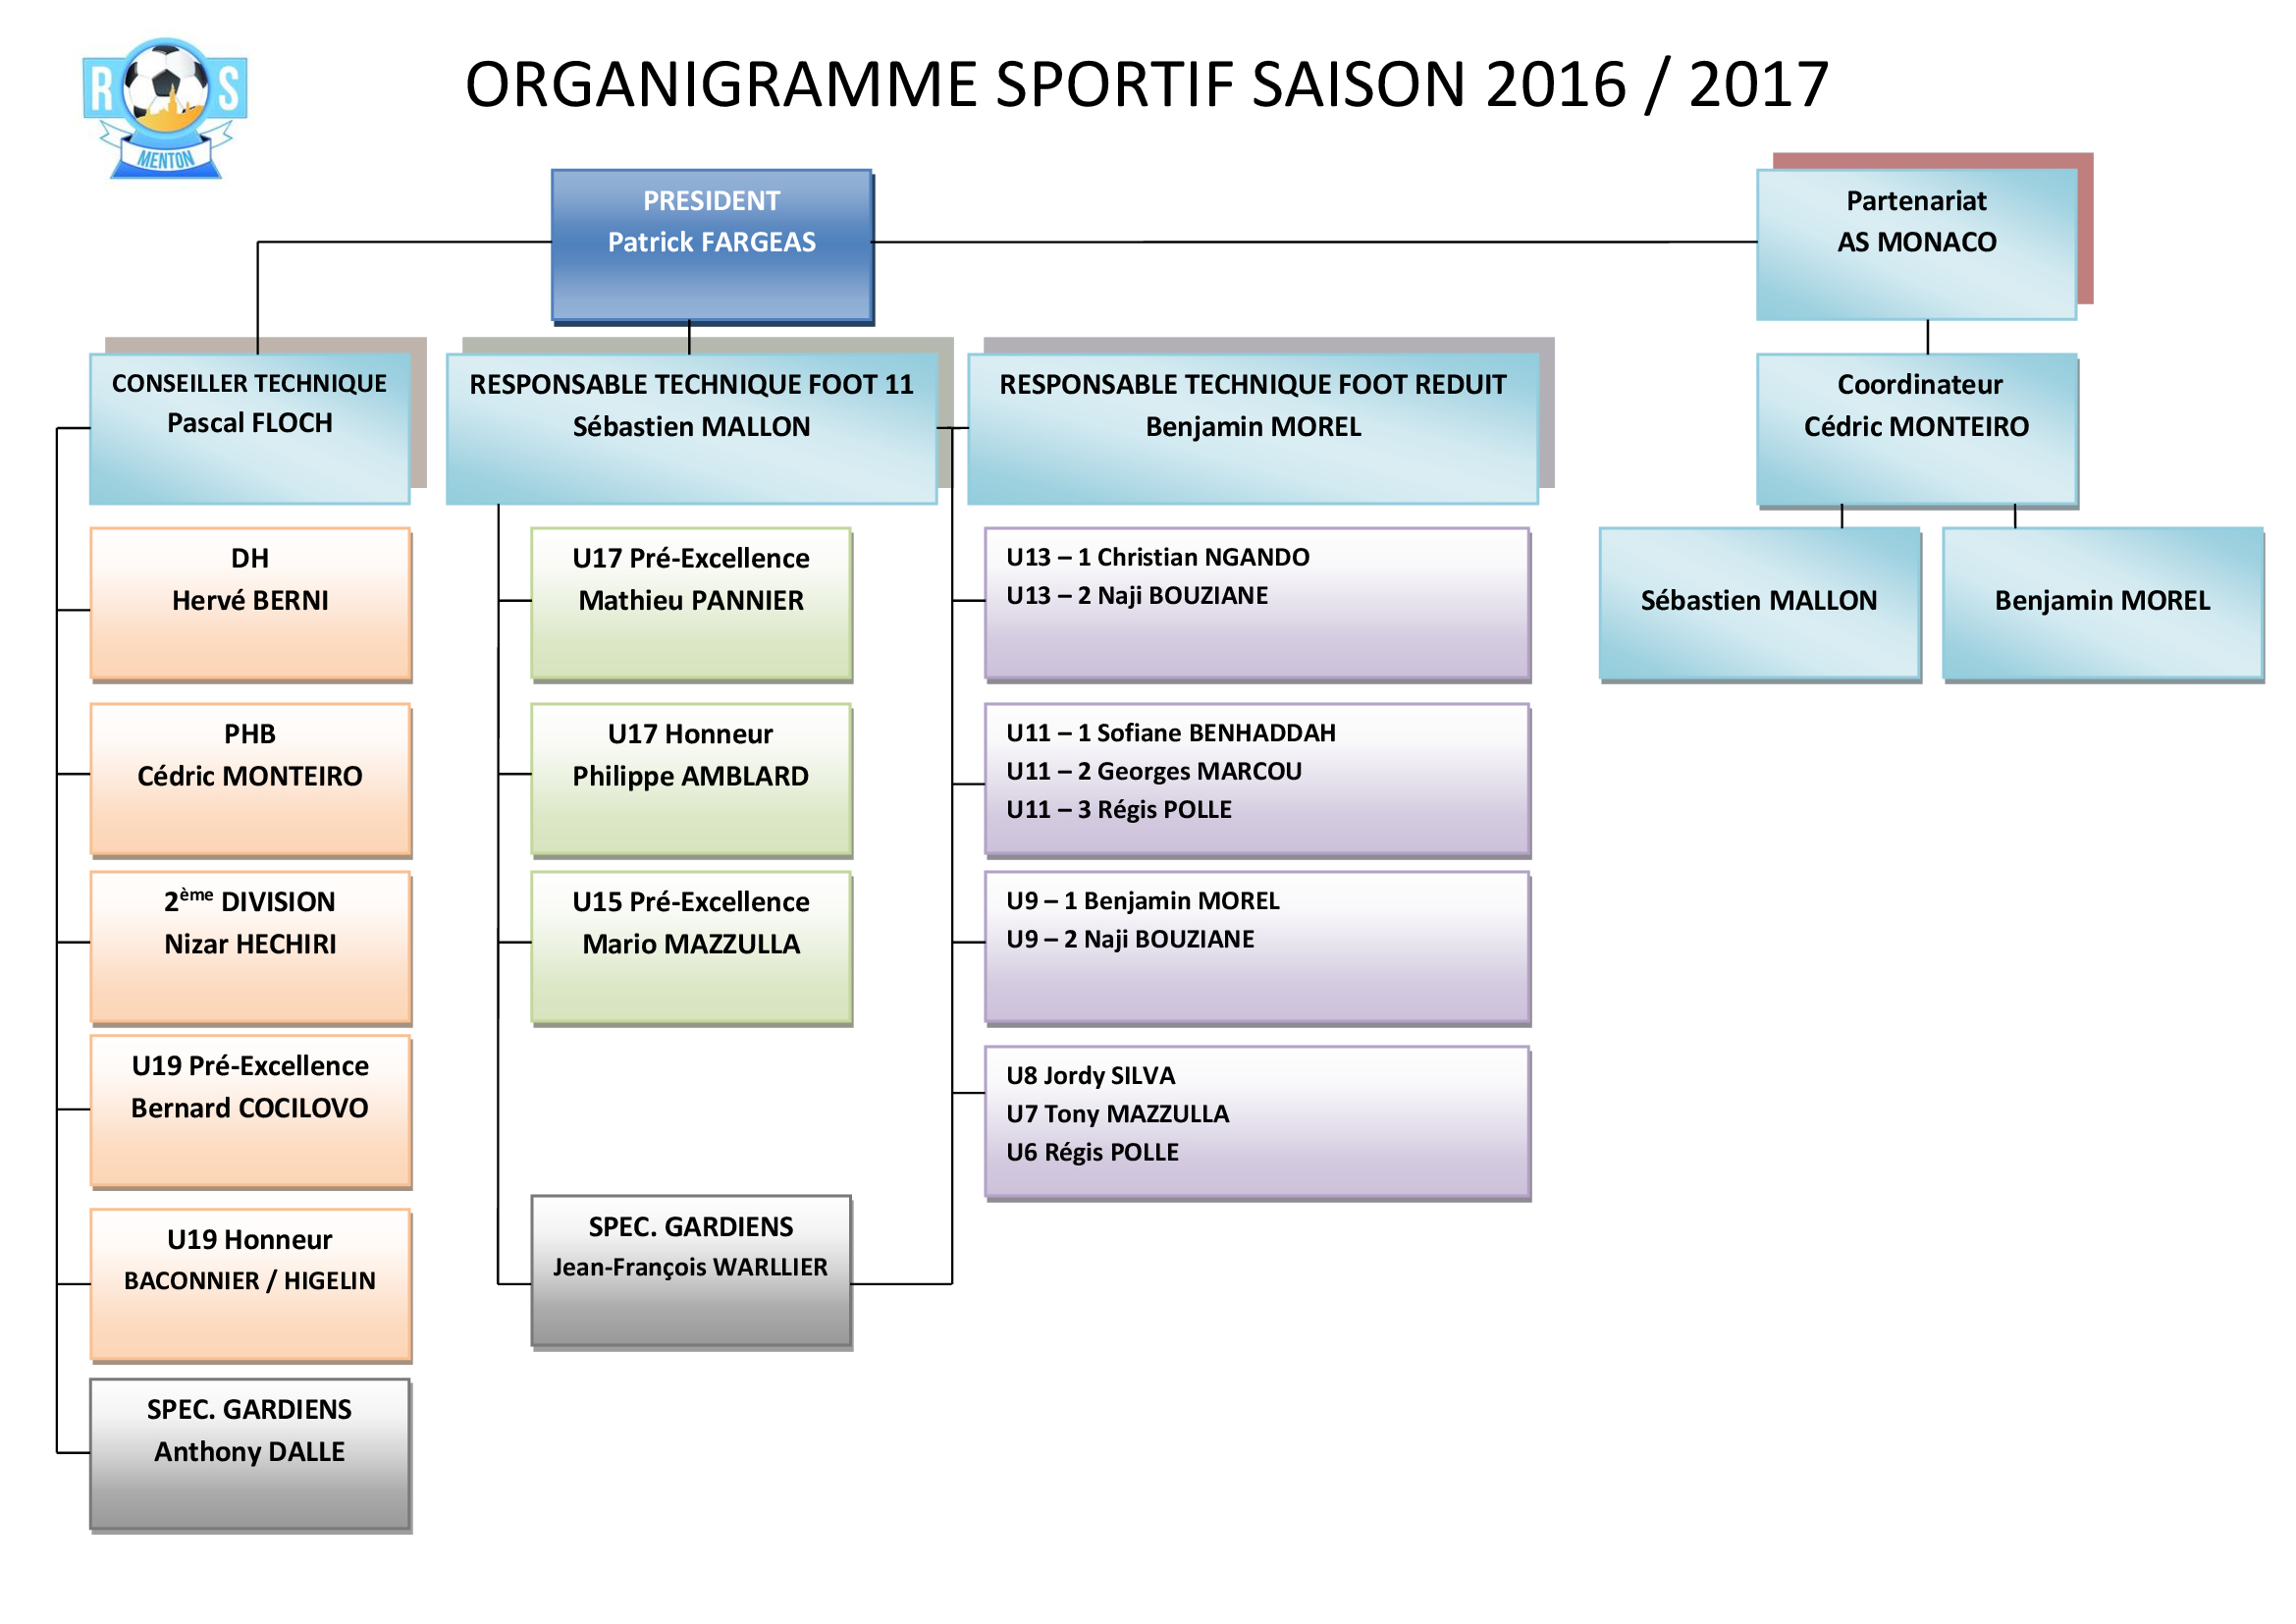 ORGANIGRAMME SPORTIF 2016 / 2017